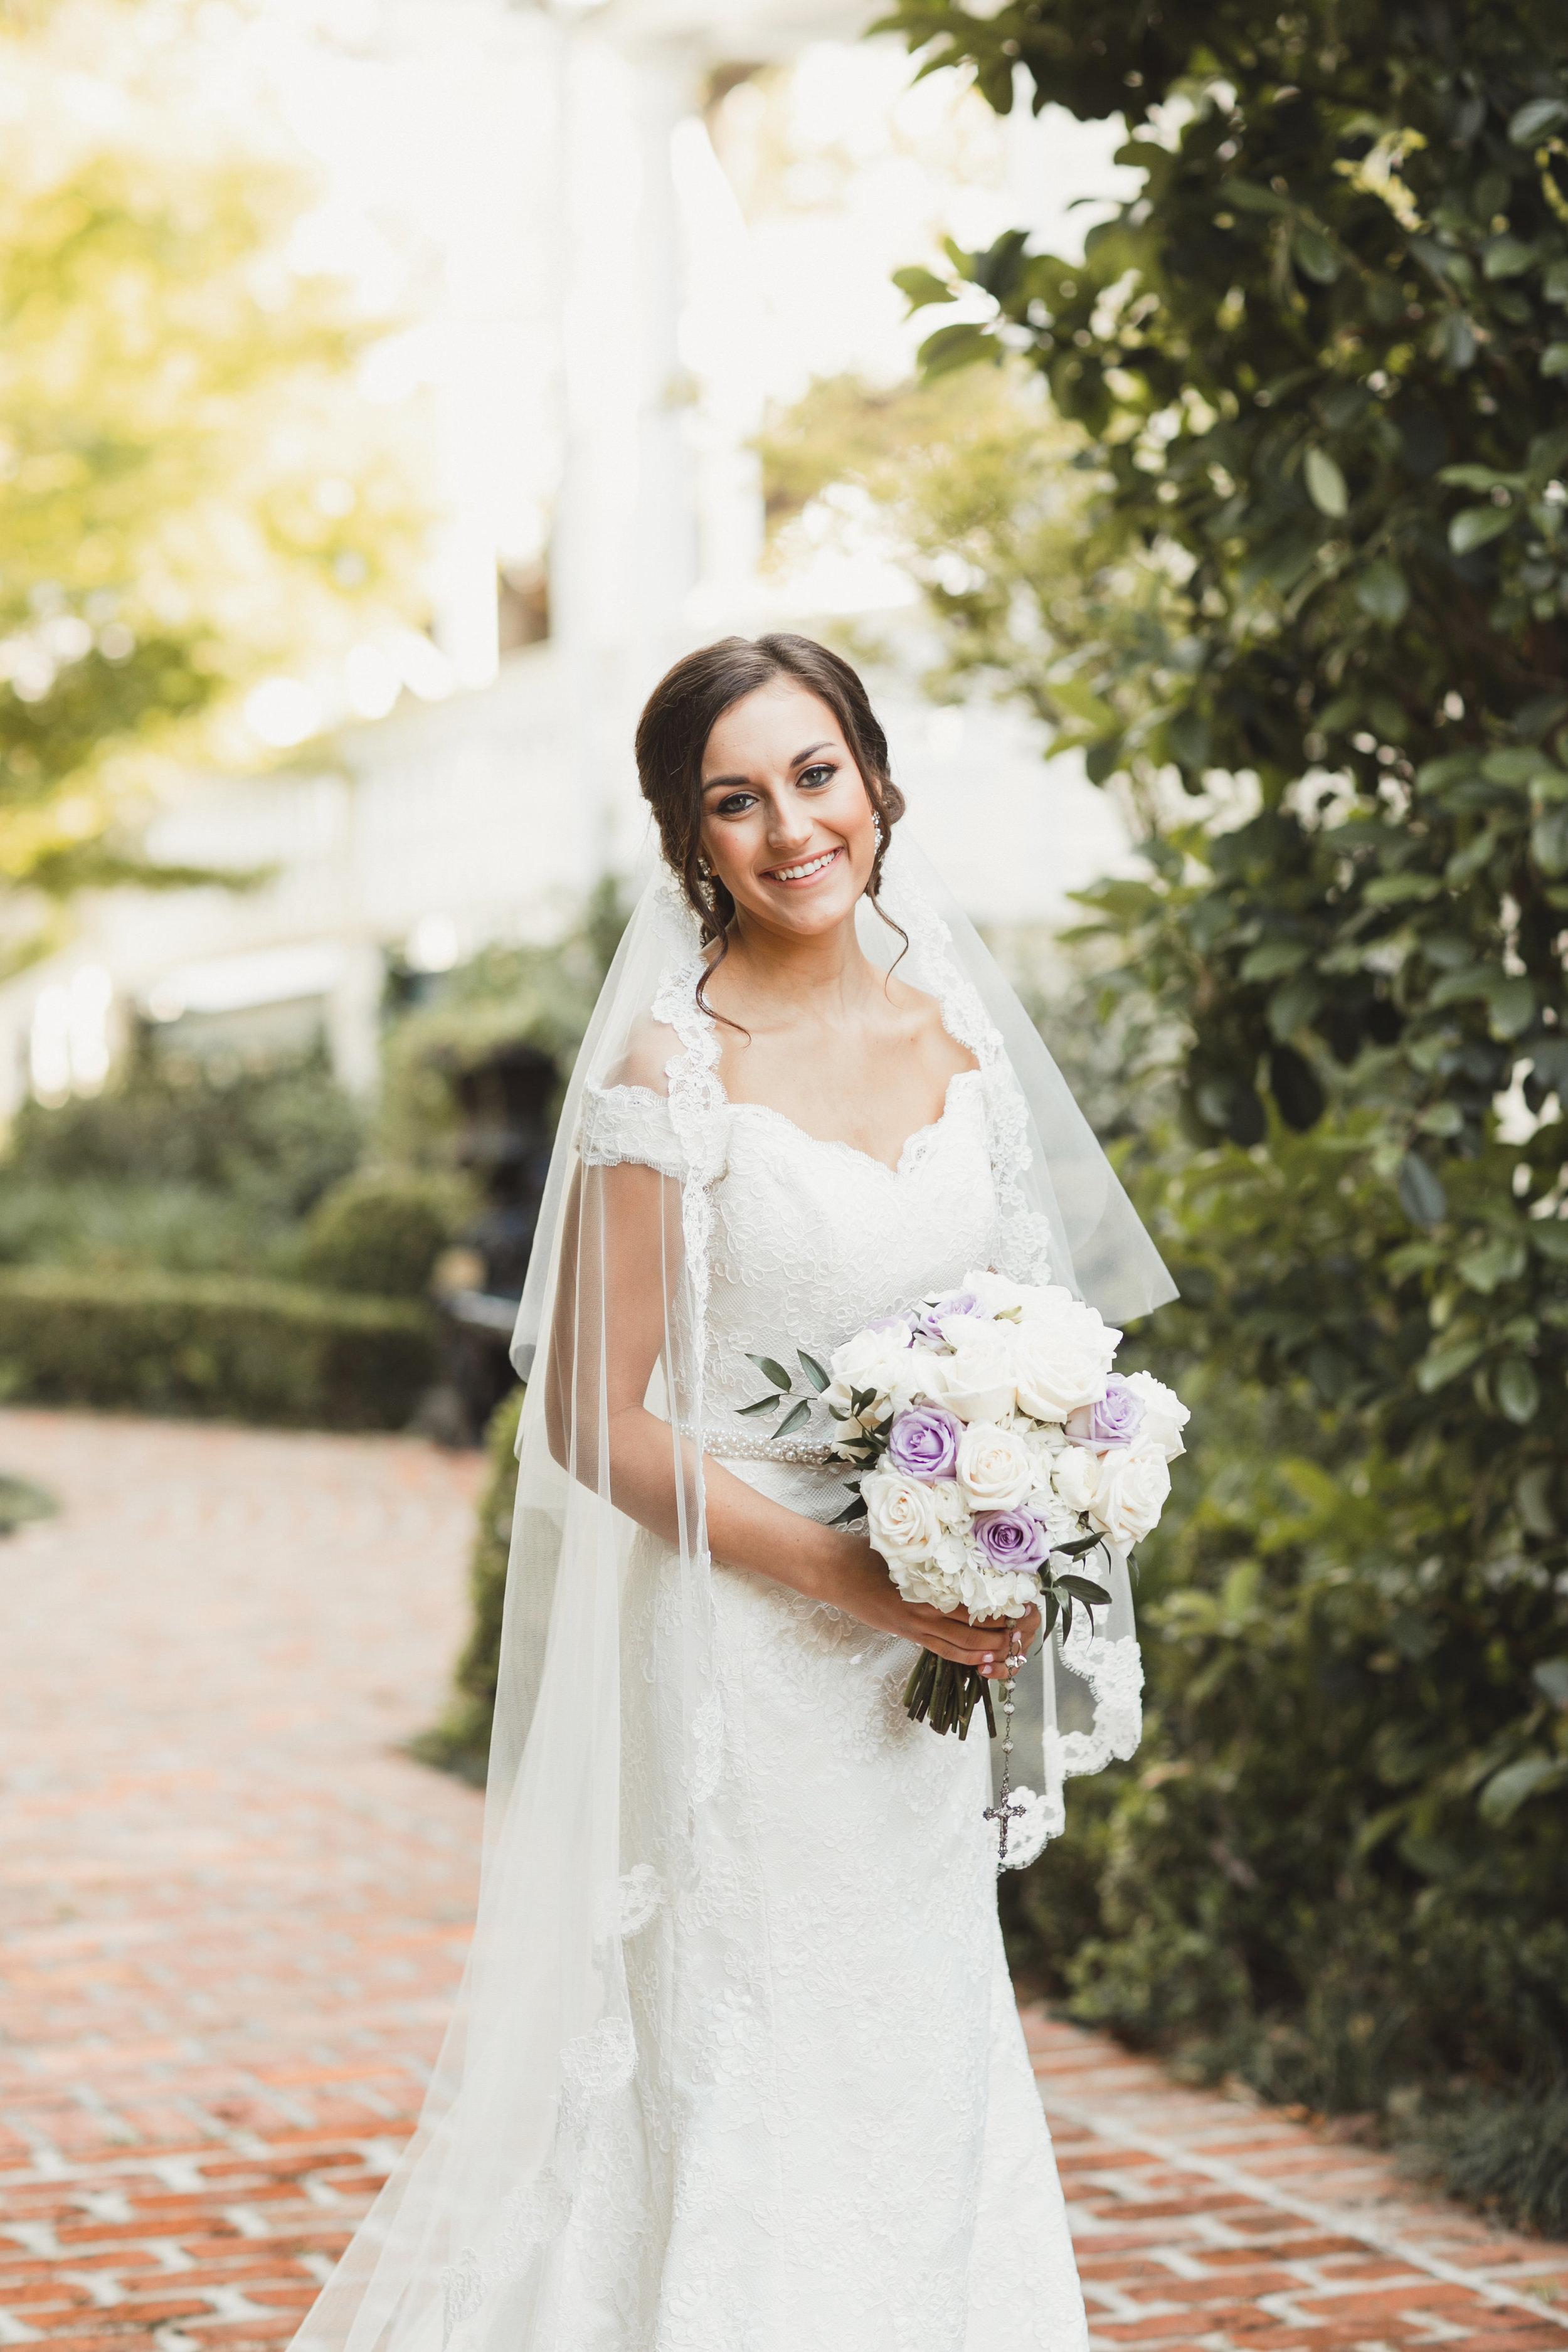 Citron_Bergeron_wedding-0255.jpg